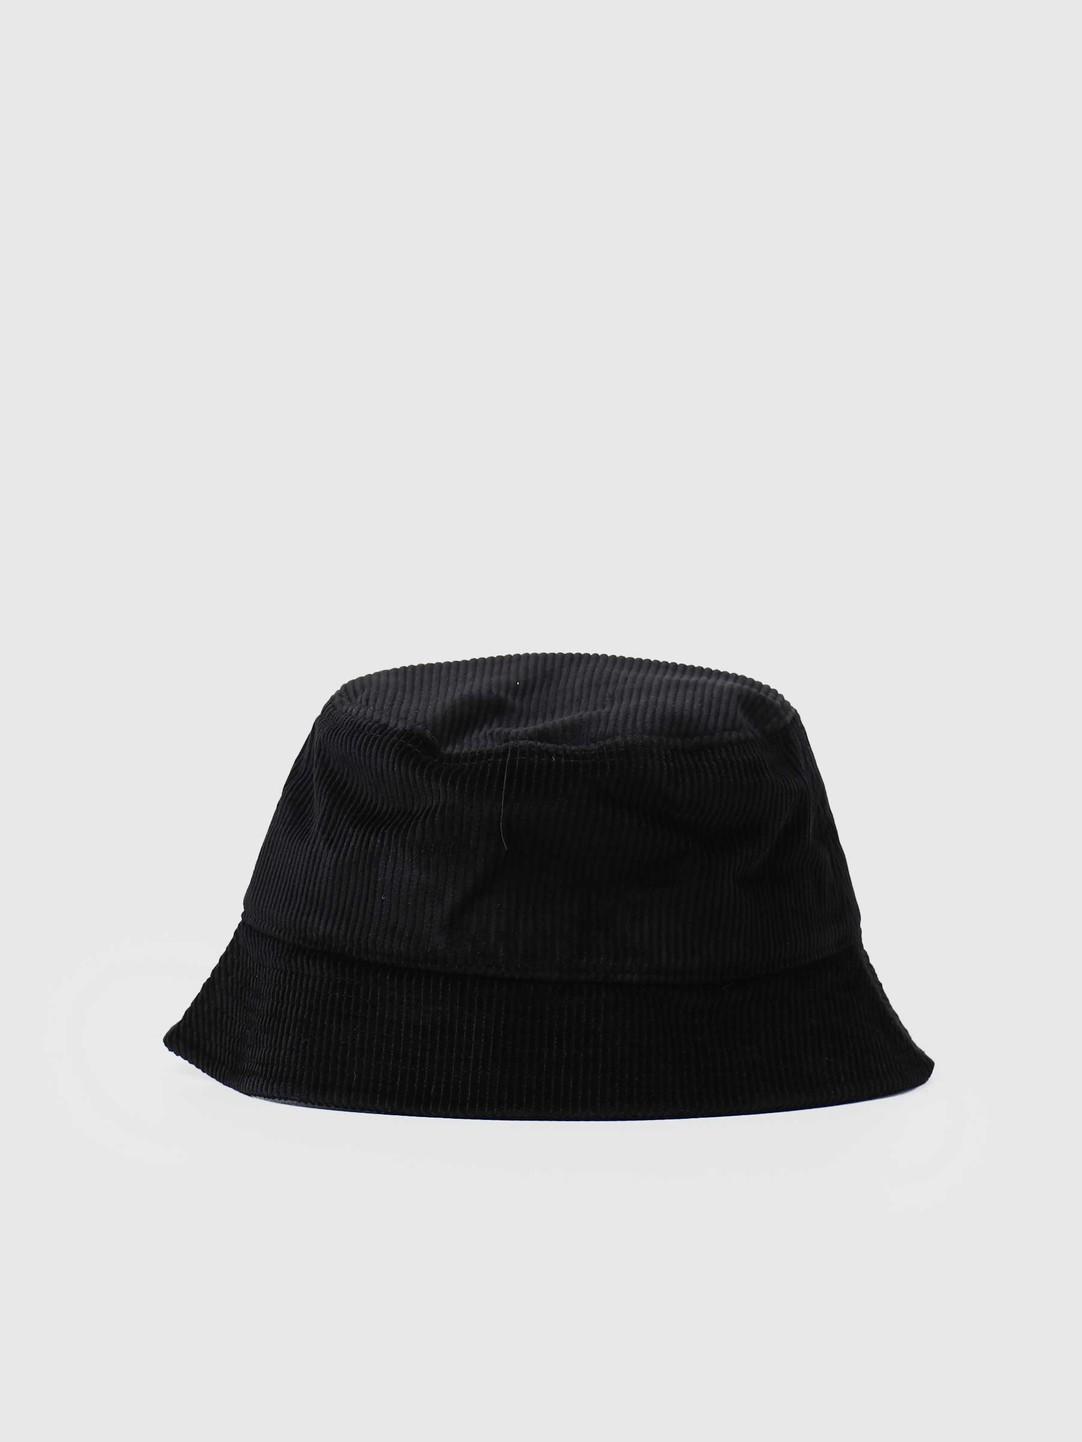 Carhartt WIP Carhartt WIP U Cord Bucket Hat Black I028162-8900